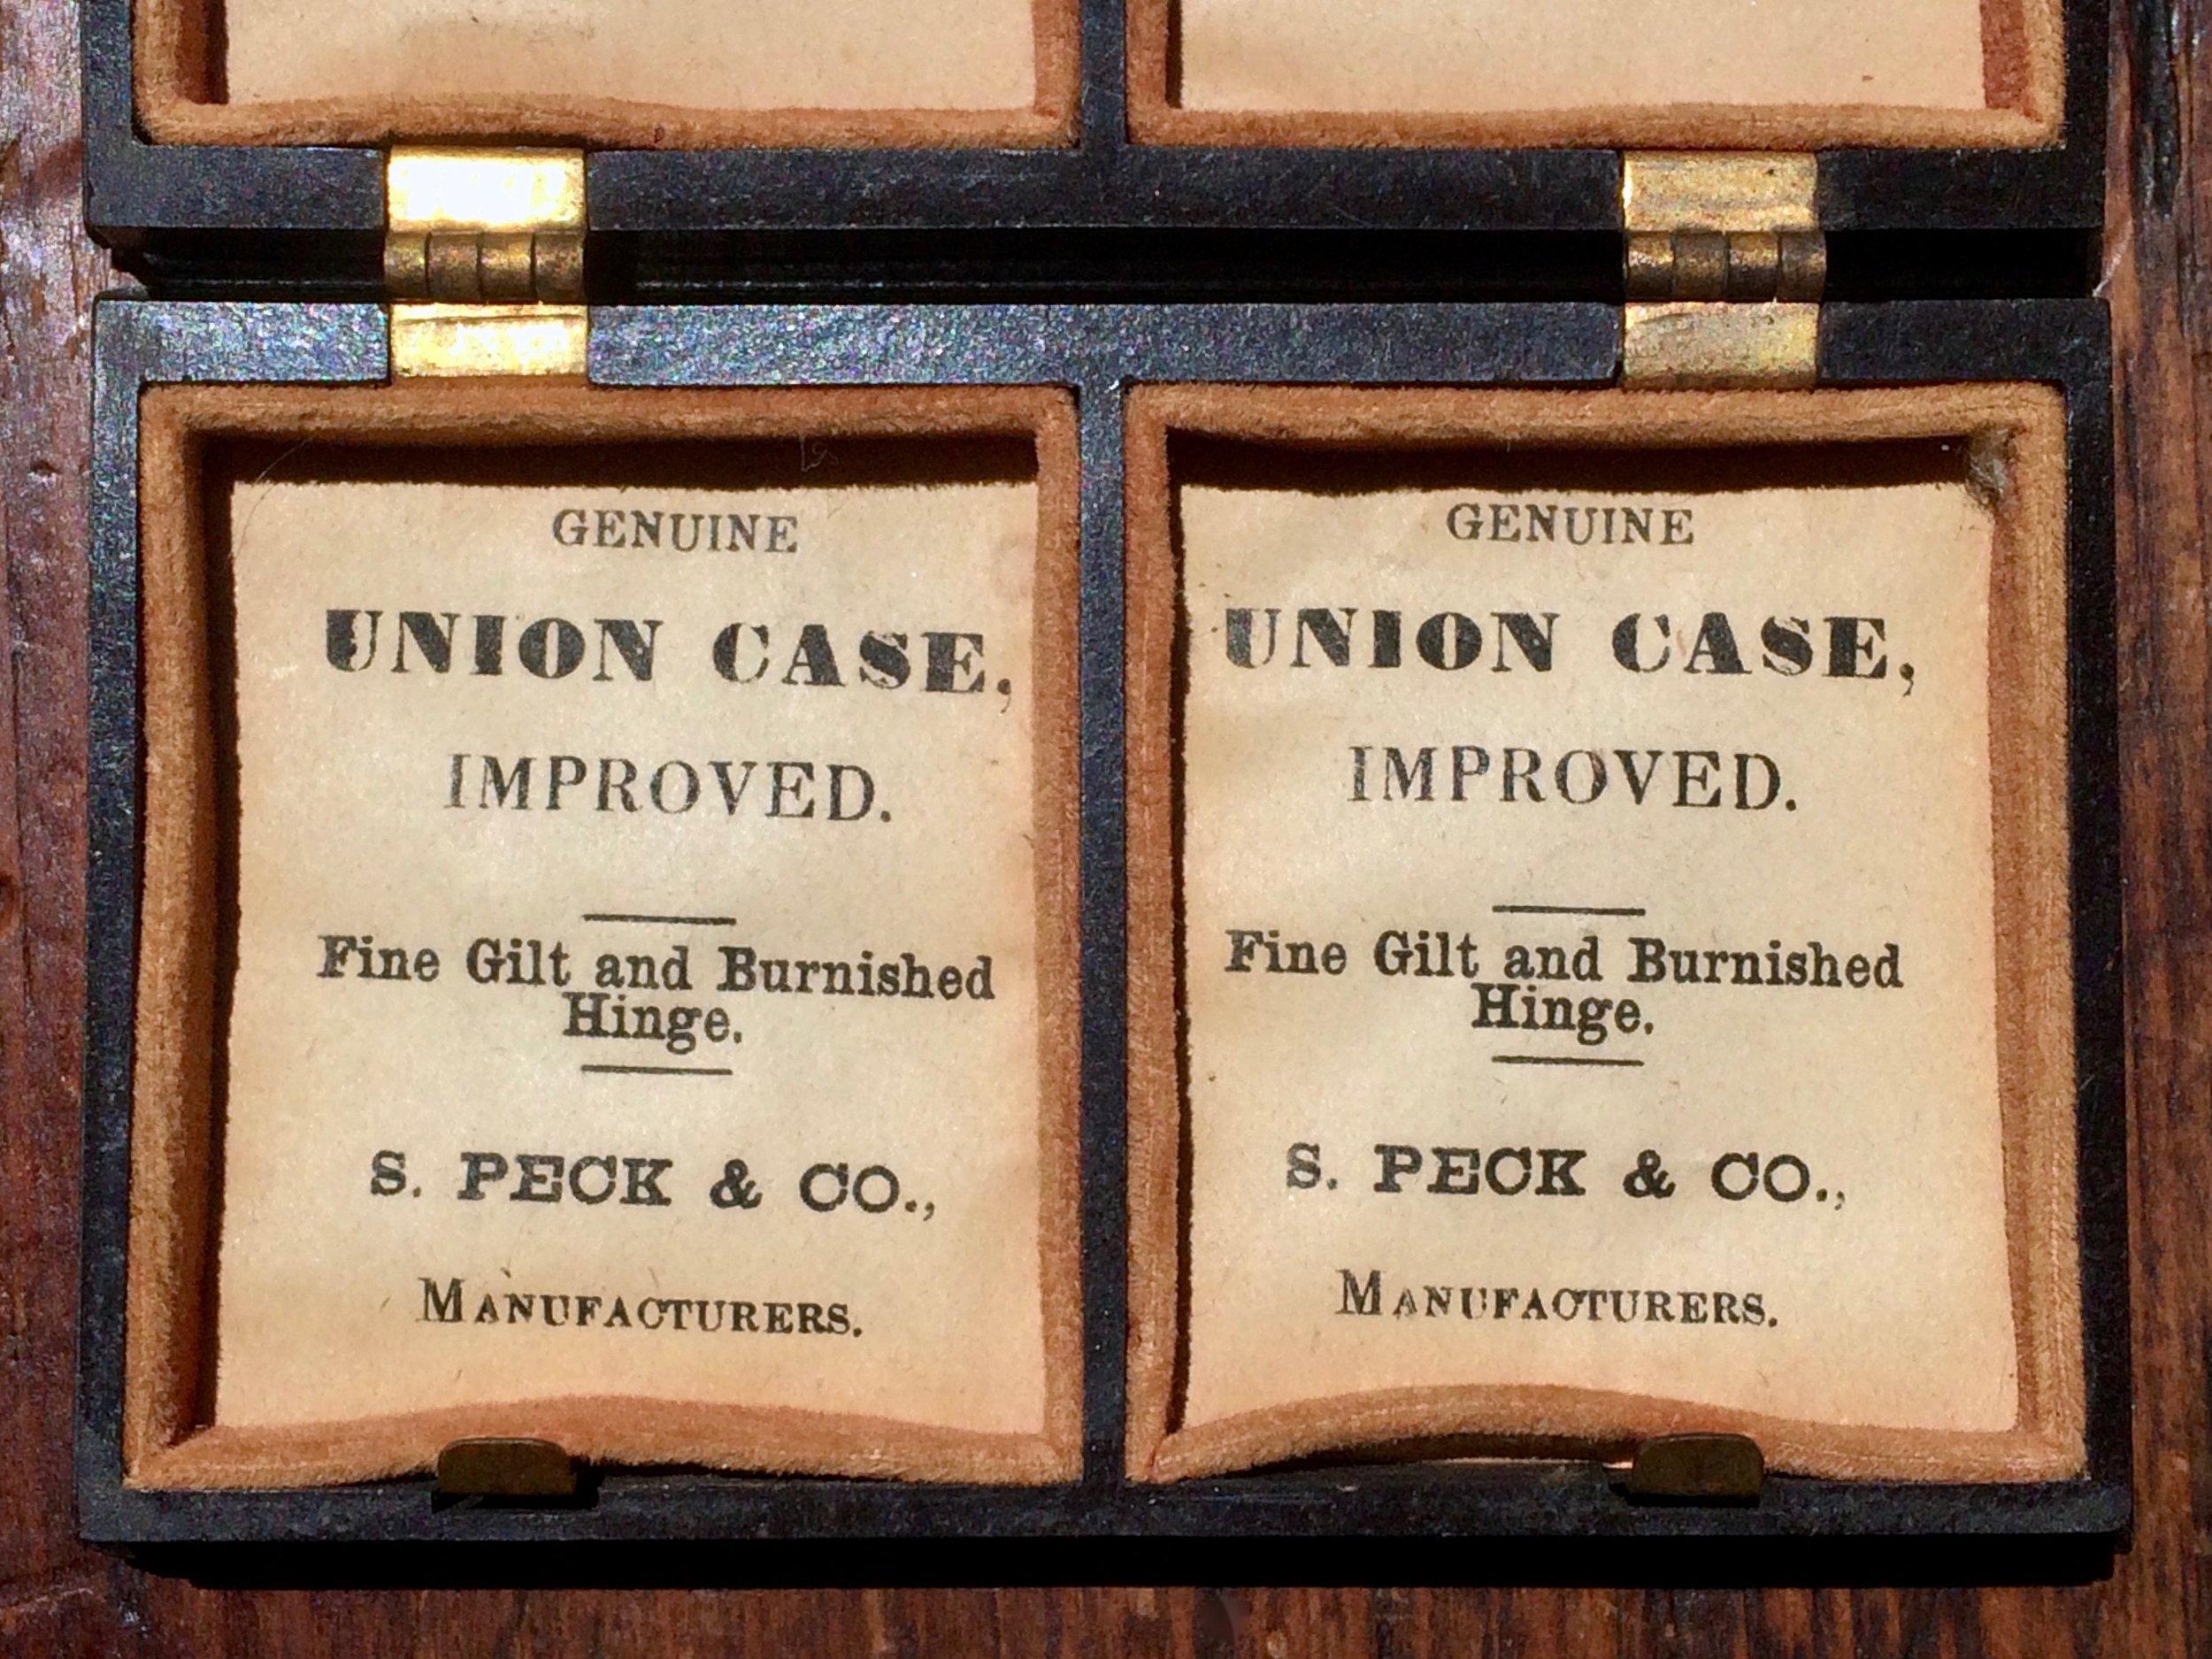 Thermoplastic Union Case